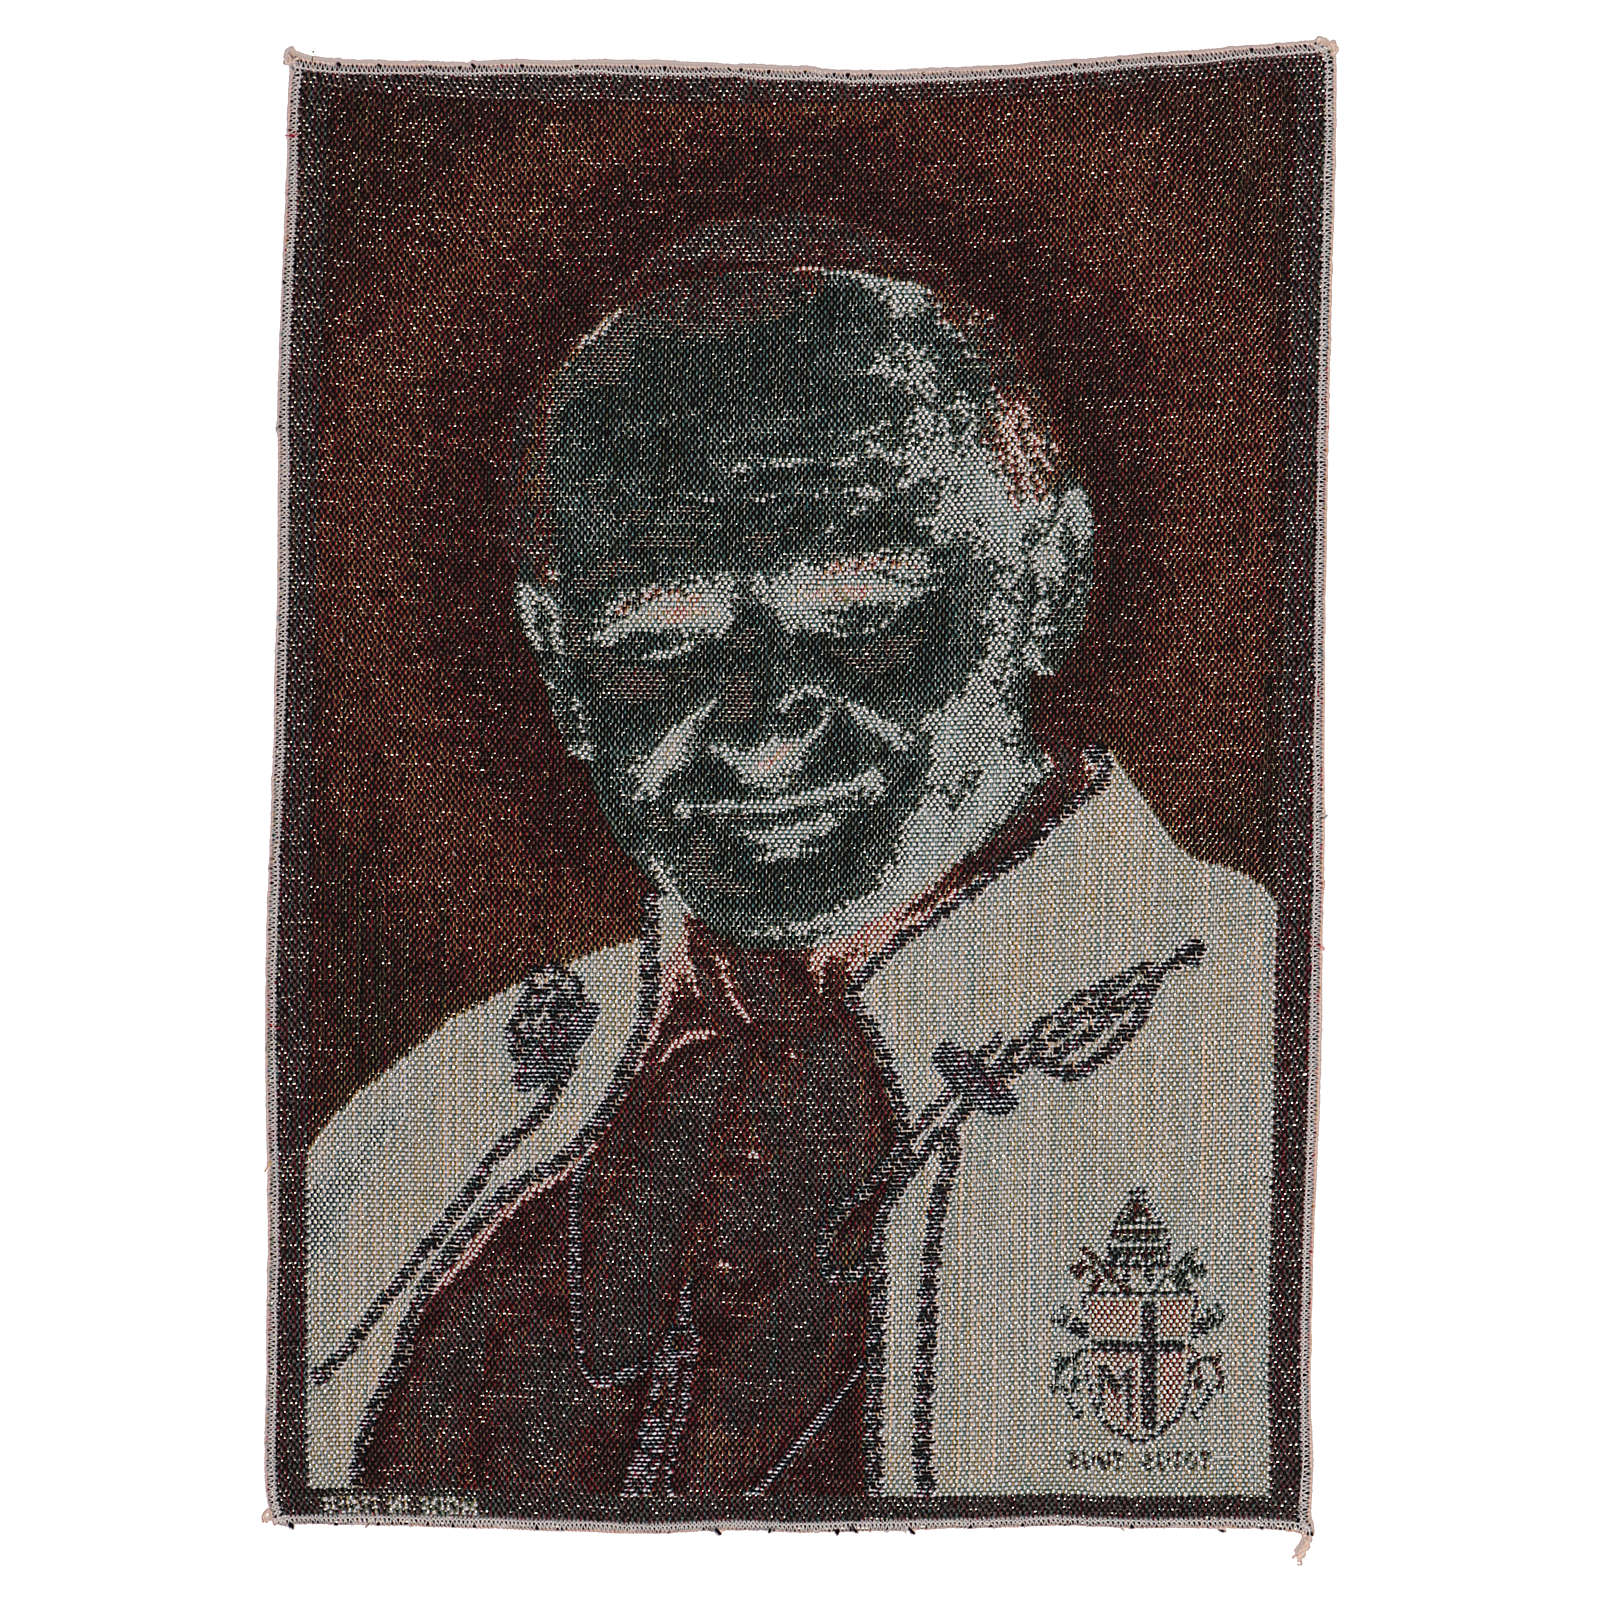 Pope John Paul II tapestry with emblem 40x30 cm 3